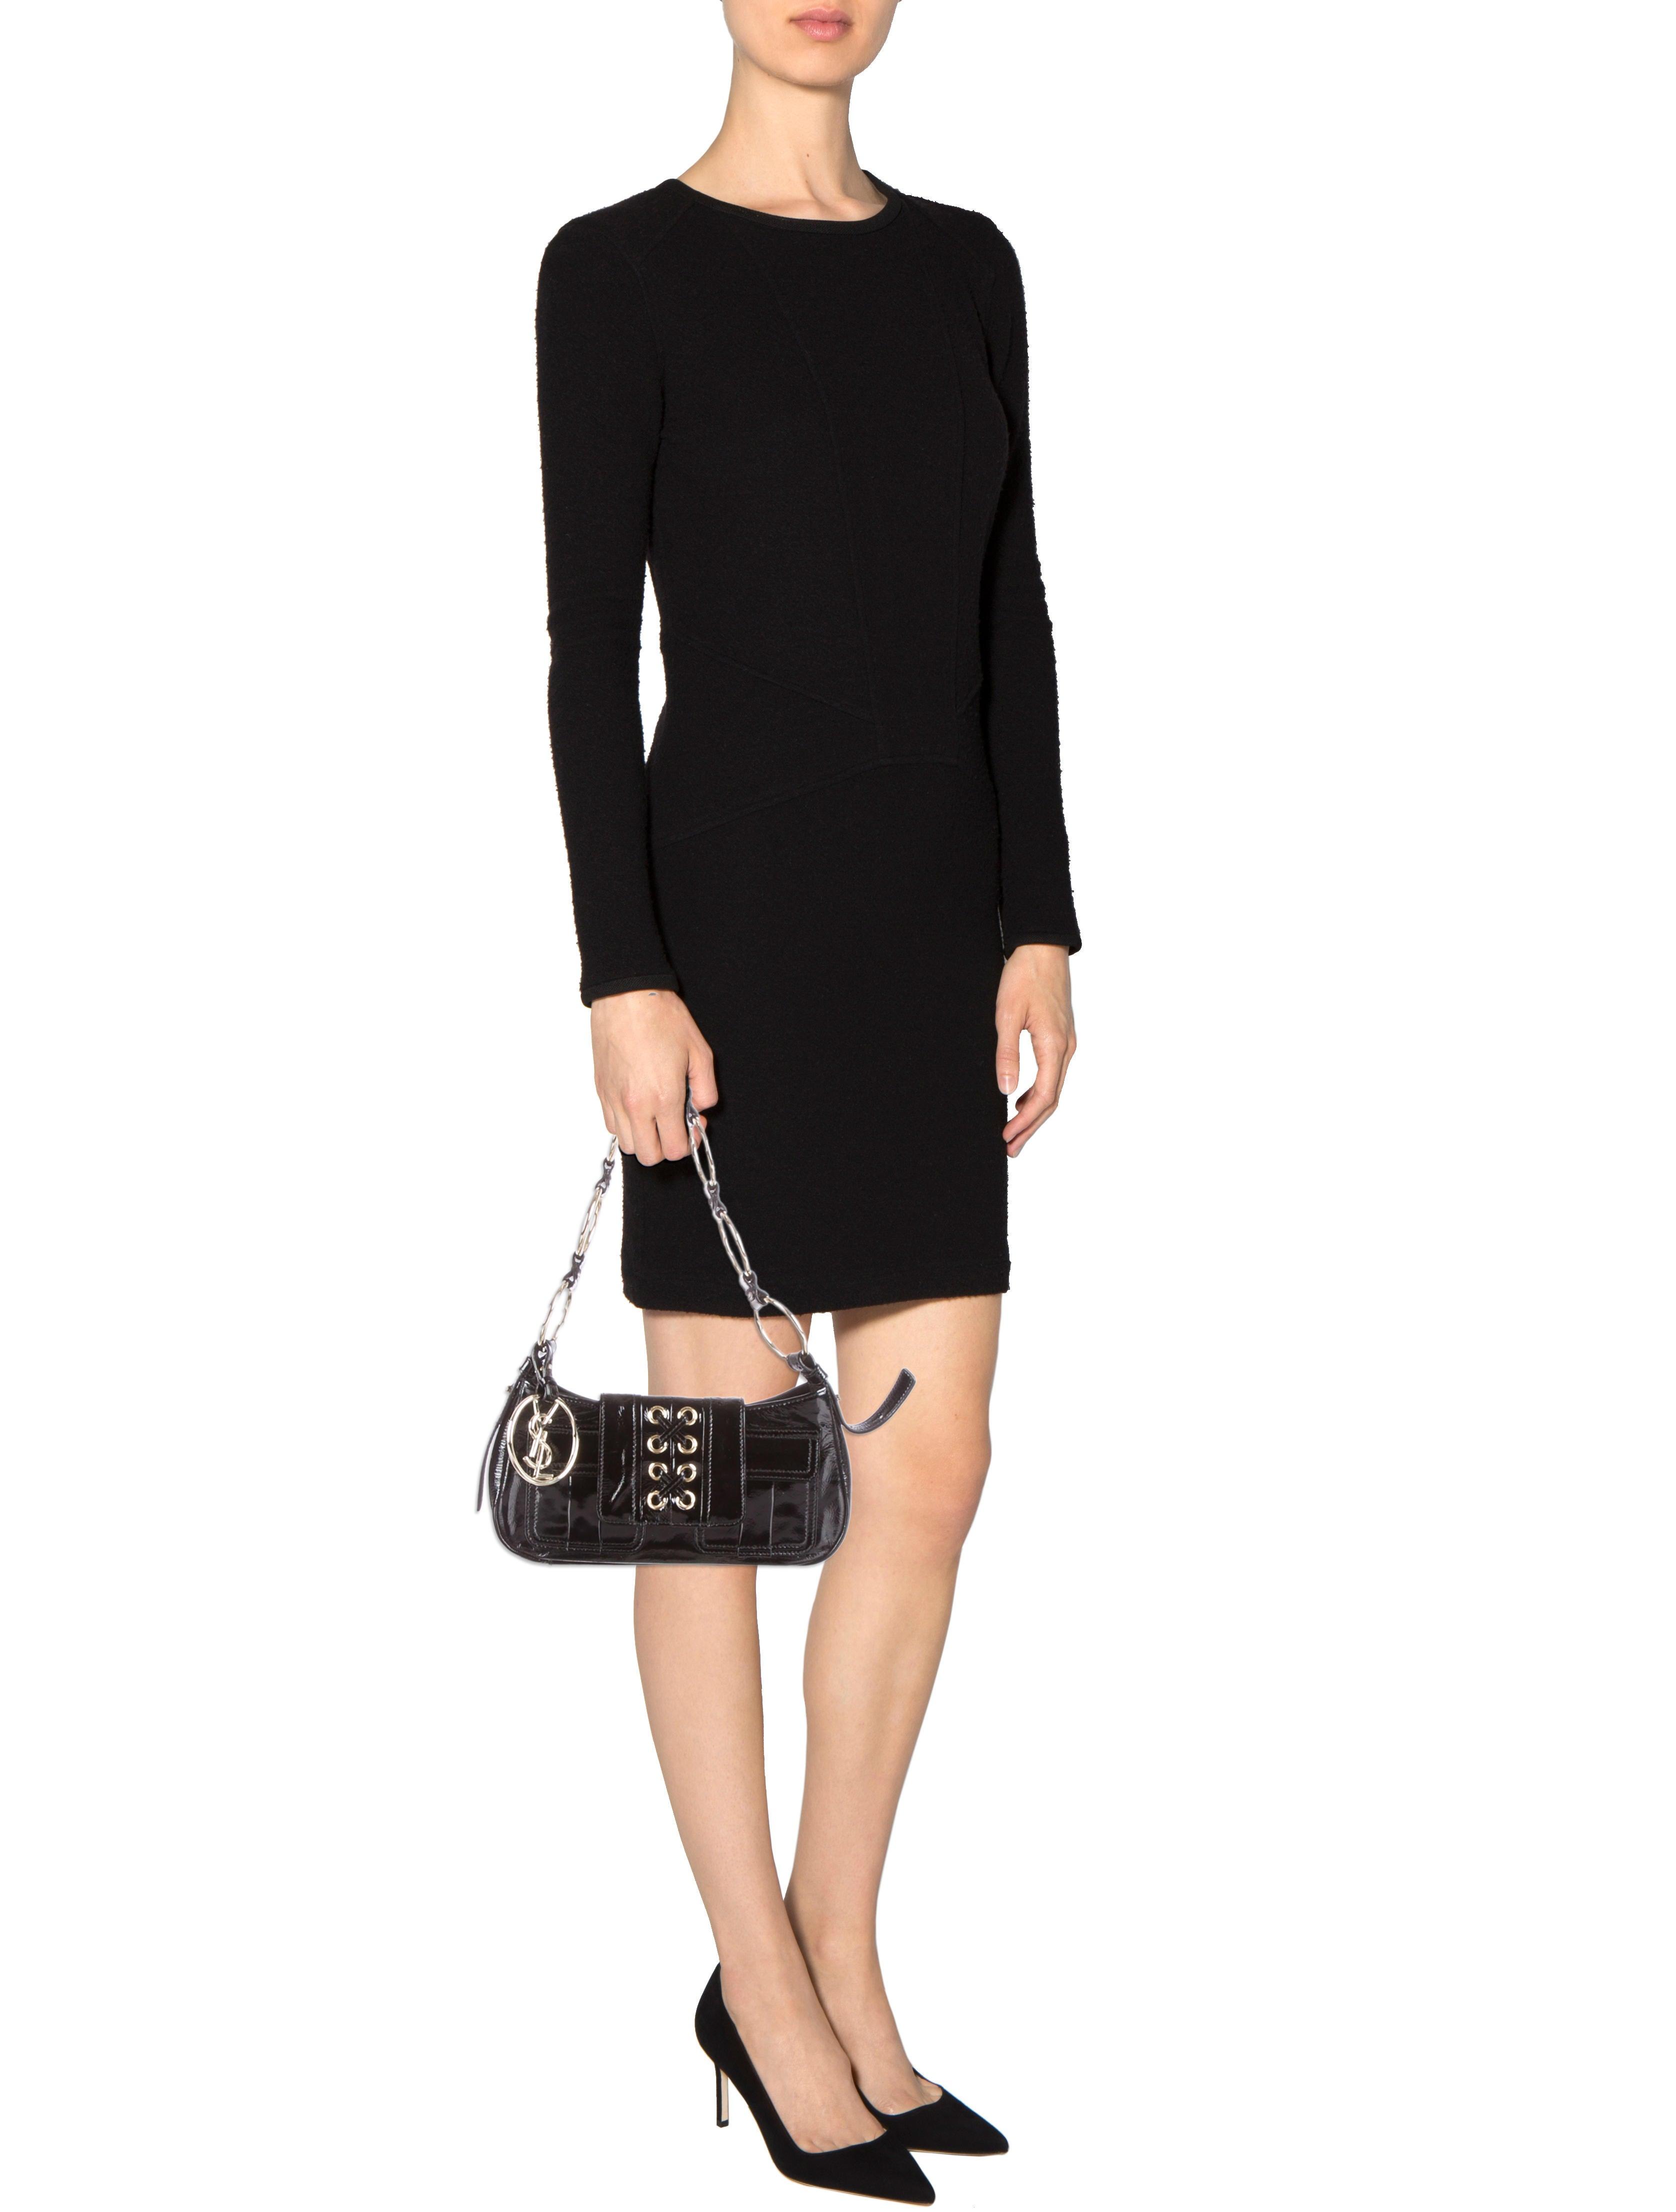 ysl patent leather bag - yves saint laurent patent leather corset shoulder bag, ysl bags sale